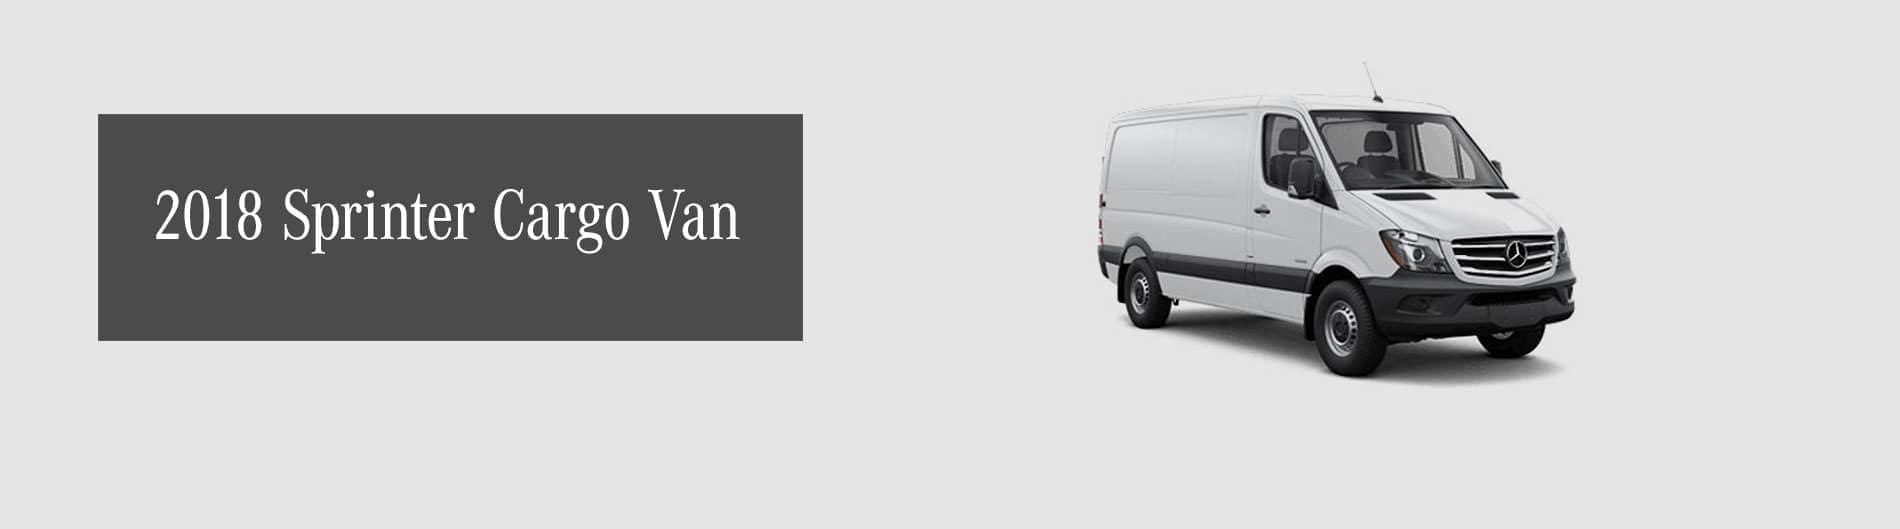 4a057b25c2a18f 2018 Sprinter V6 2500 Cargo 144 Van